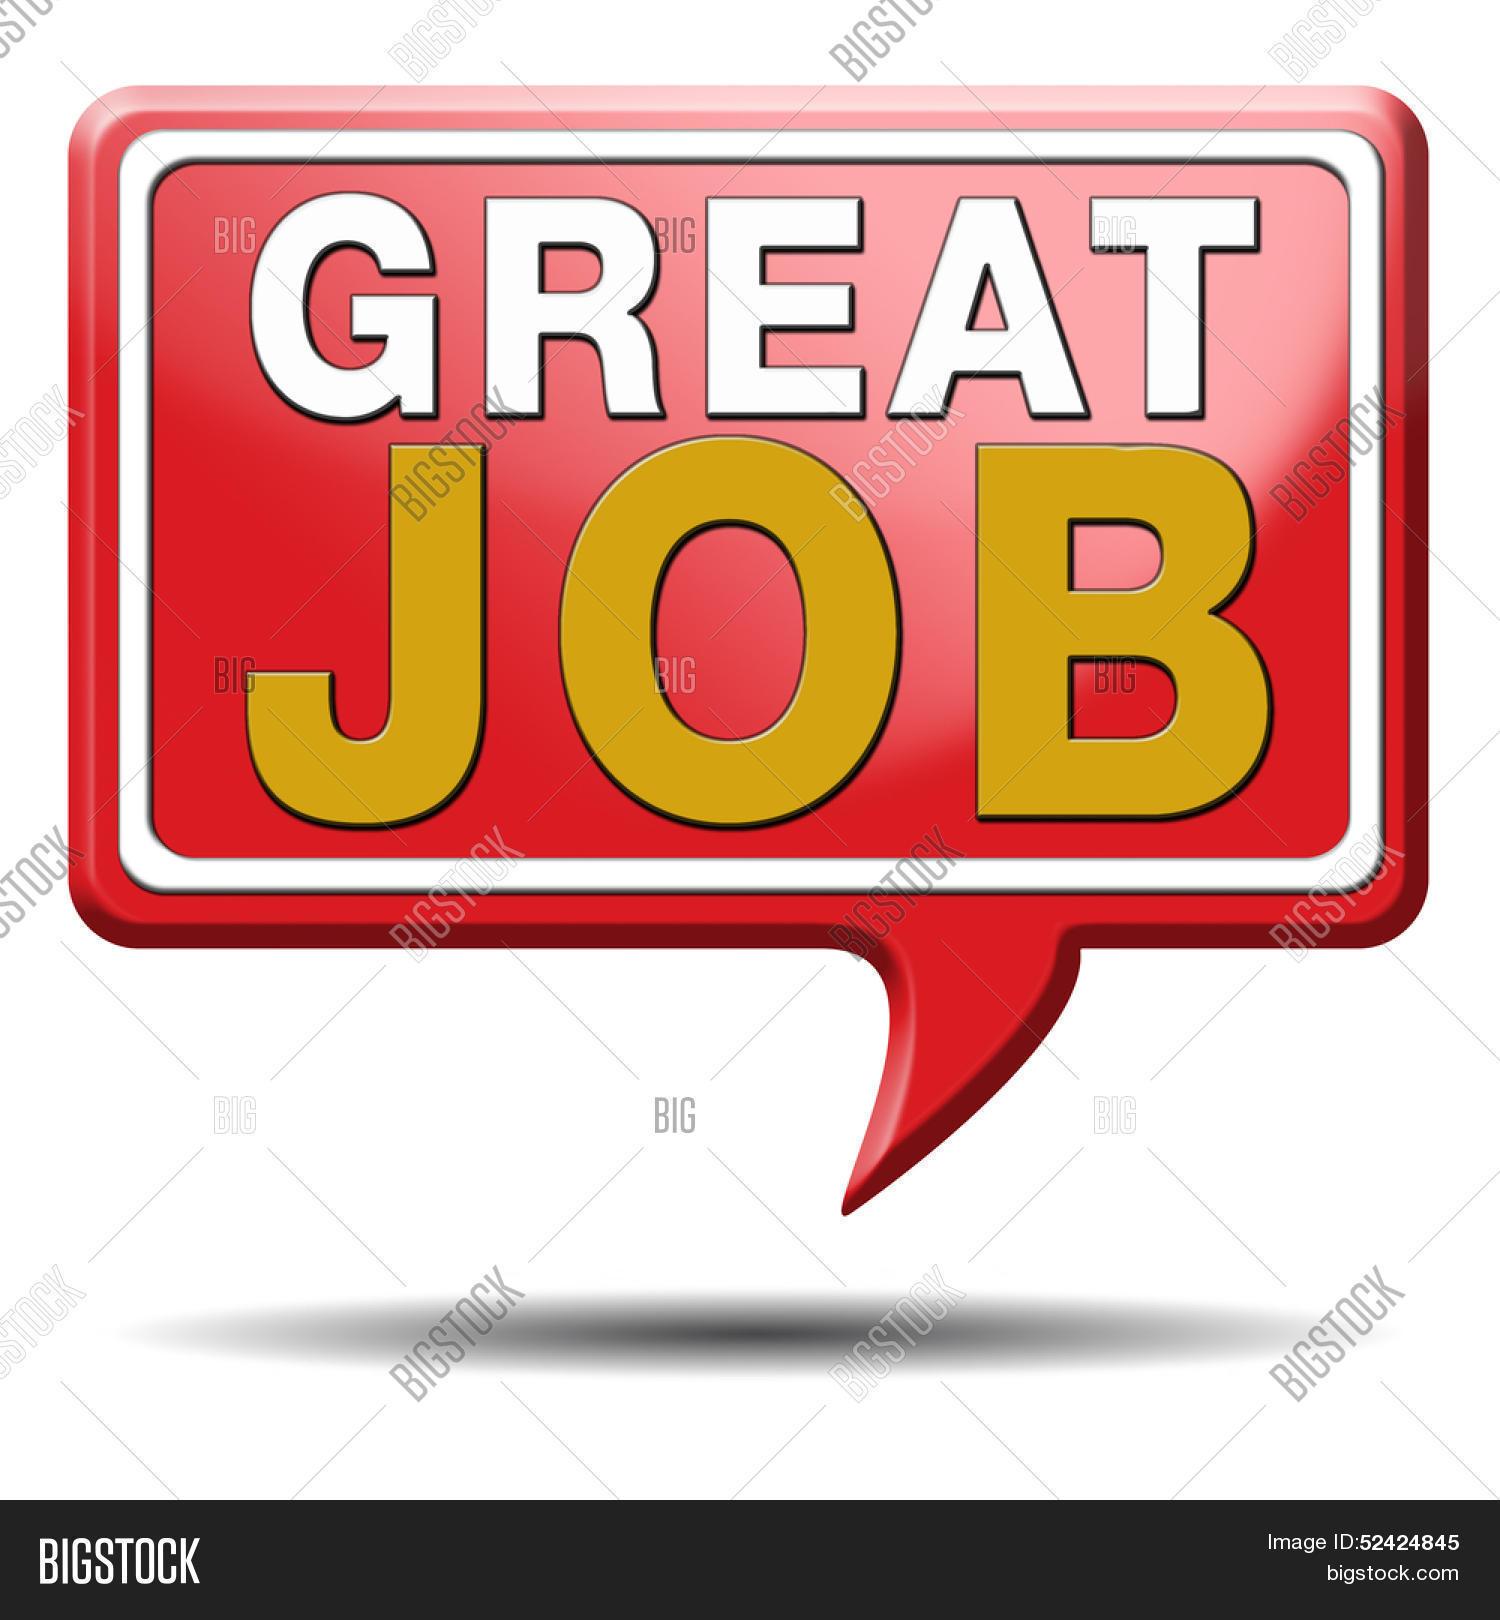 Clip Art Great Job Team Images - Transparent Good Job Images Free, HD Png  Download - kindpng